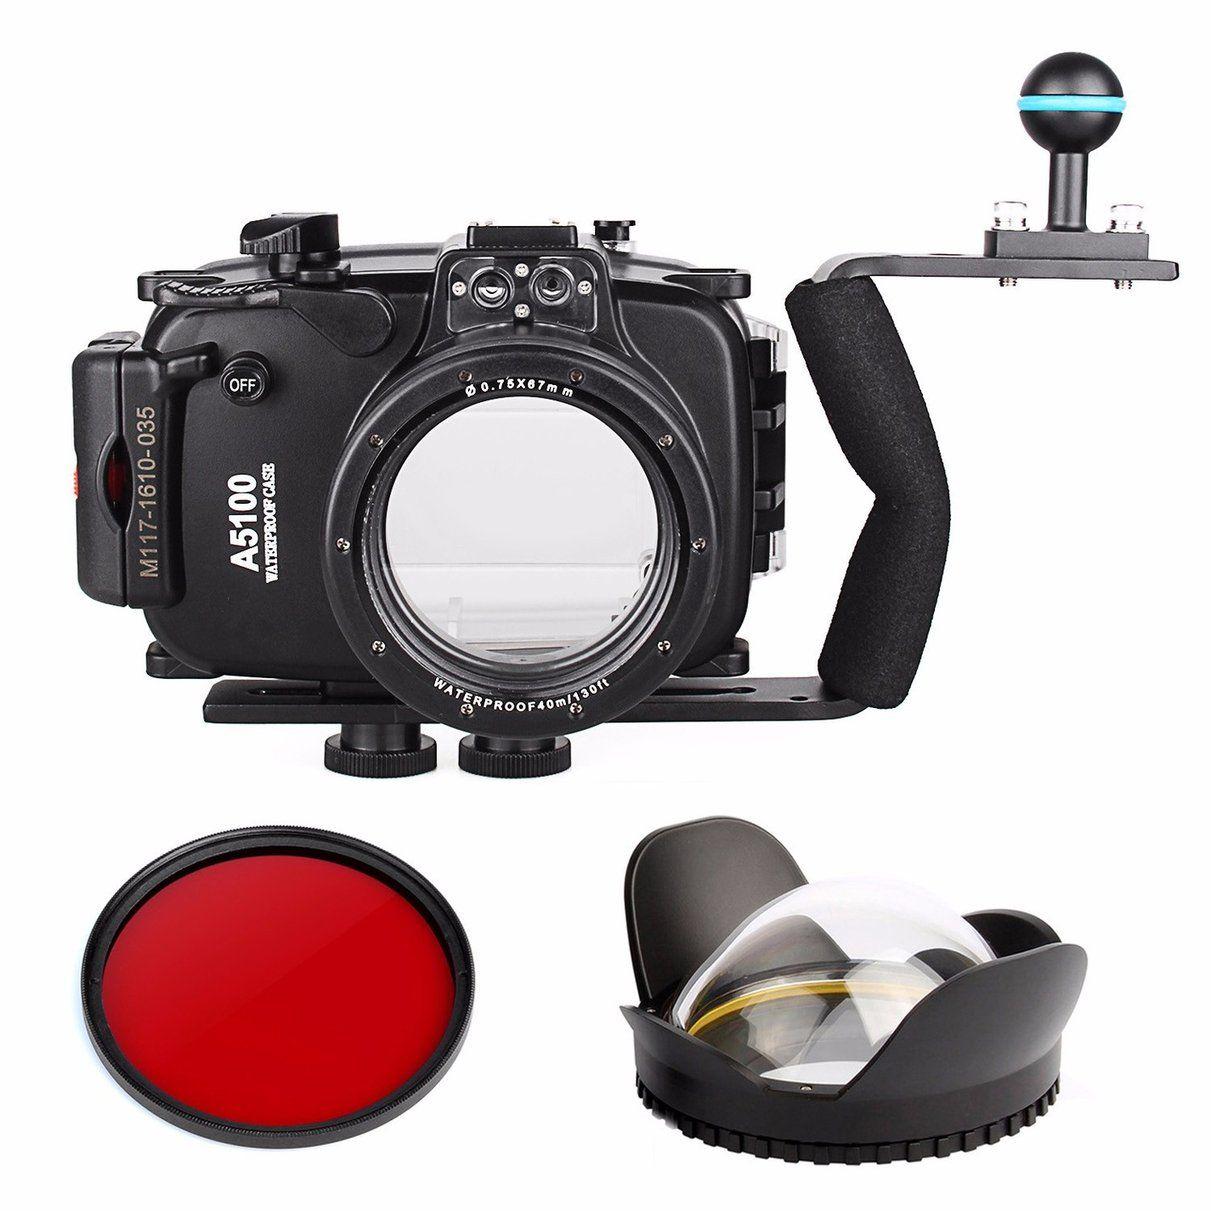 40m 130ft Waterproof Underwater Camera Housing Case Bag For Sony A5100 16 50mm Lens Diving Handle Underwater Camera Housing Diving Camera Underwater Camera